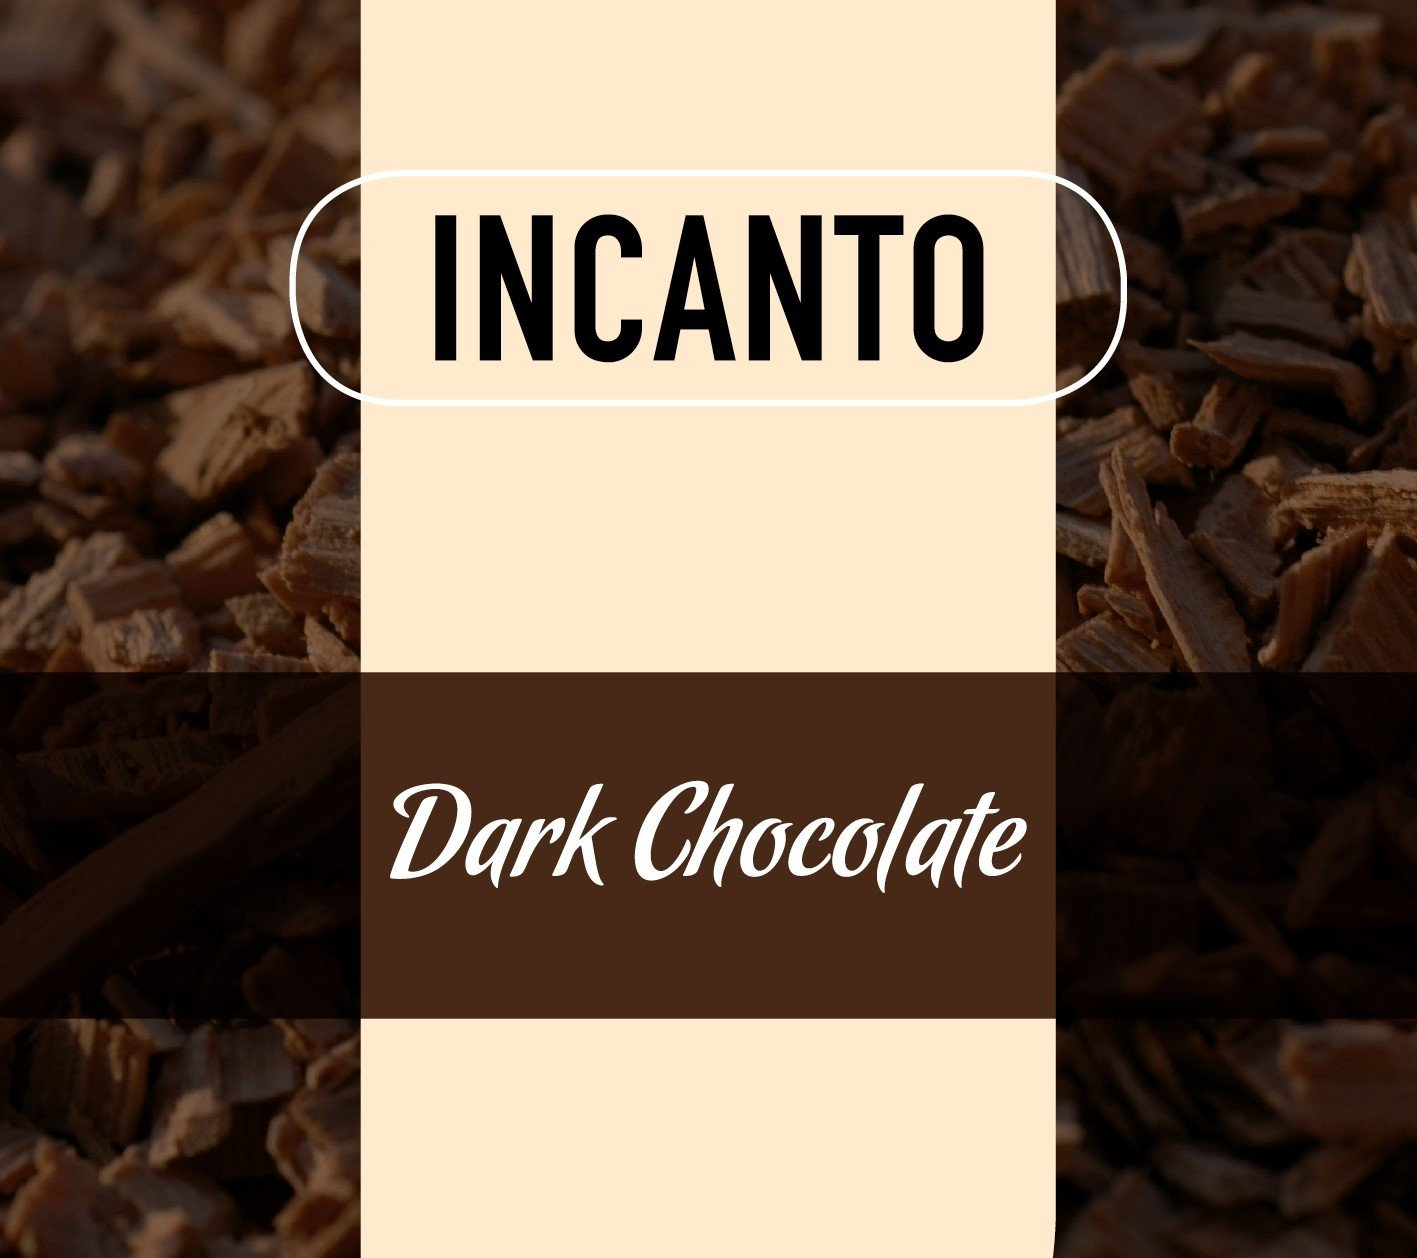 Incanto Chips Dark Chocolate